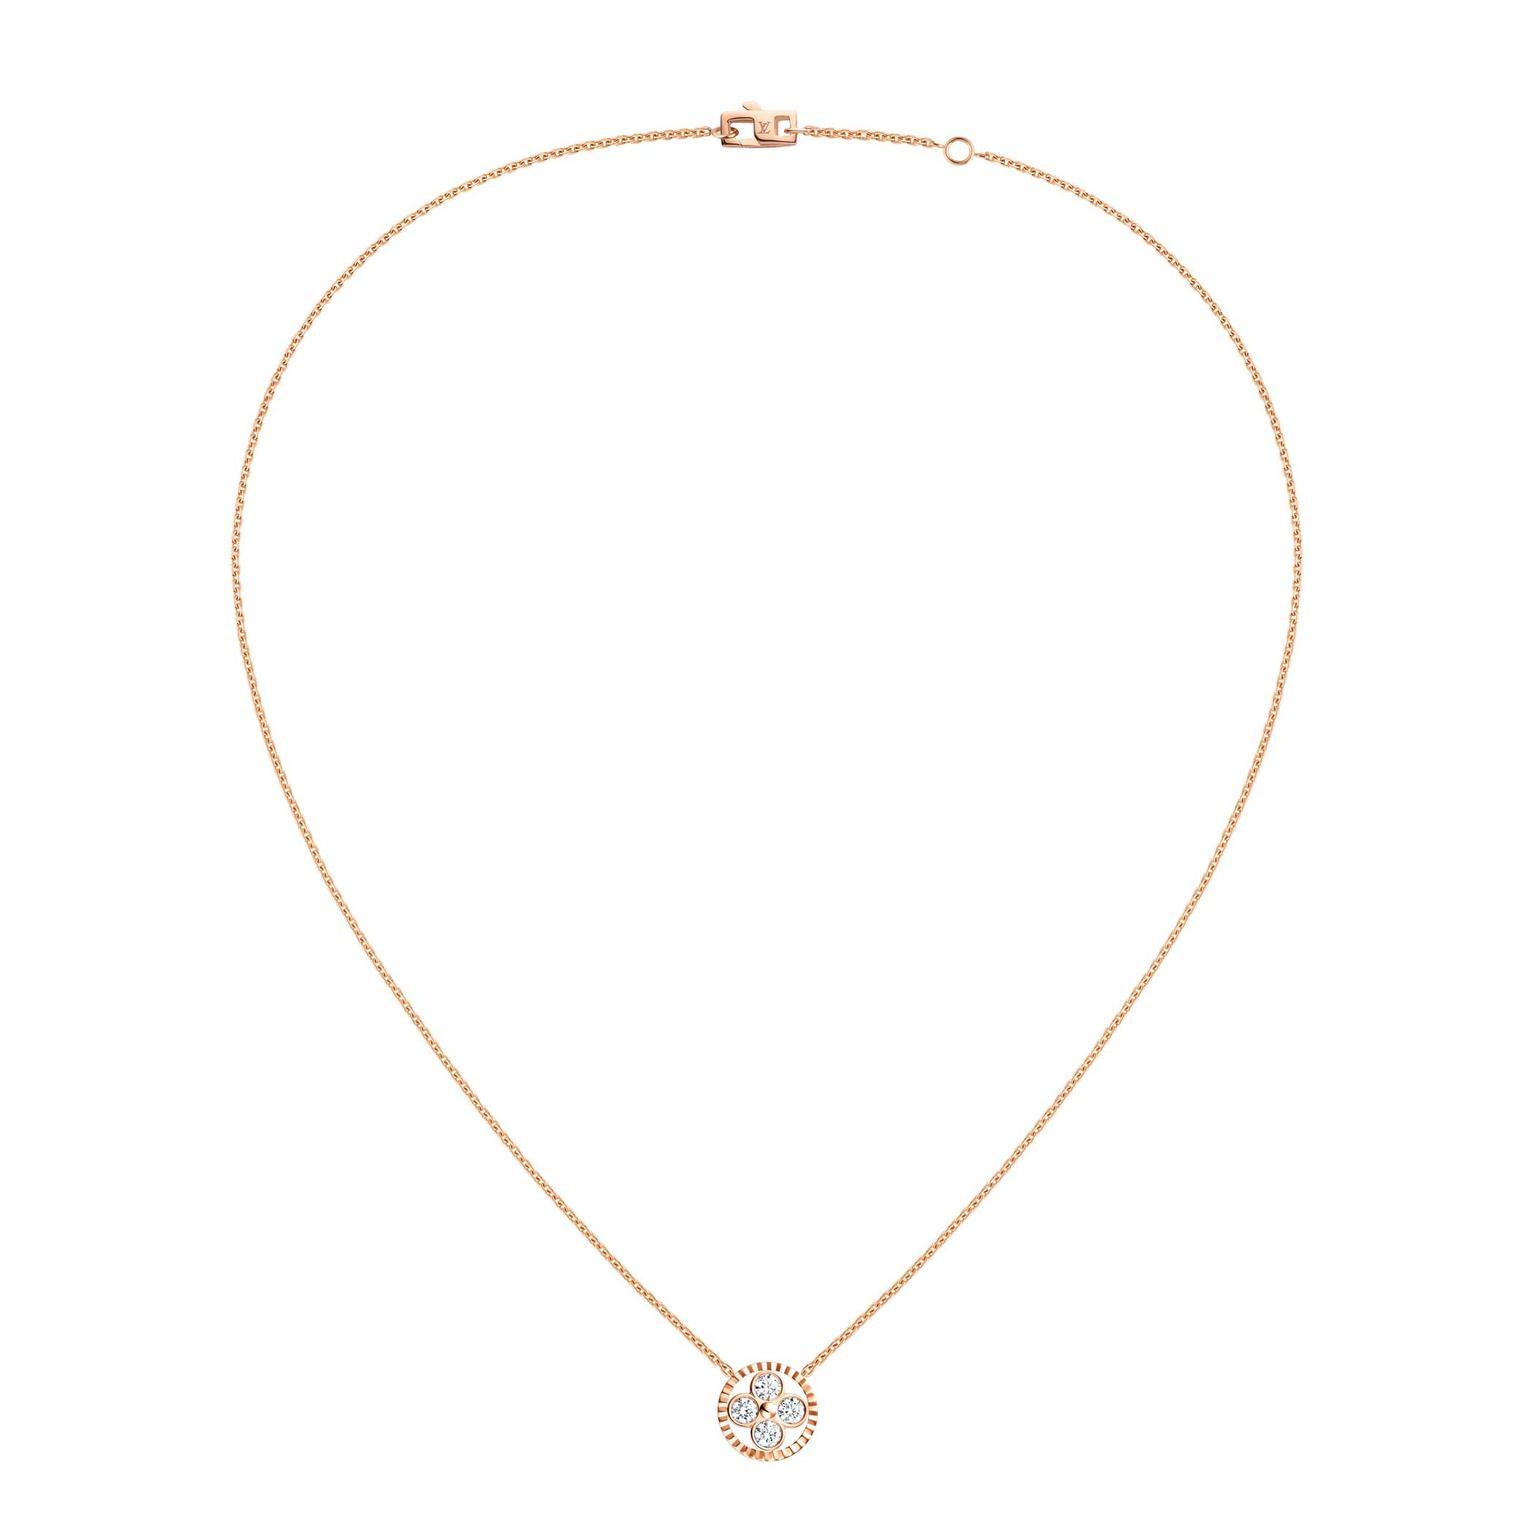 Monogram Sun diamond pendant necklace in rose gold with diamonds